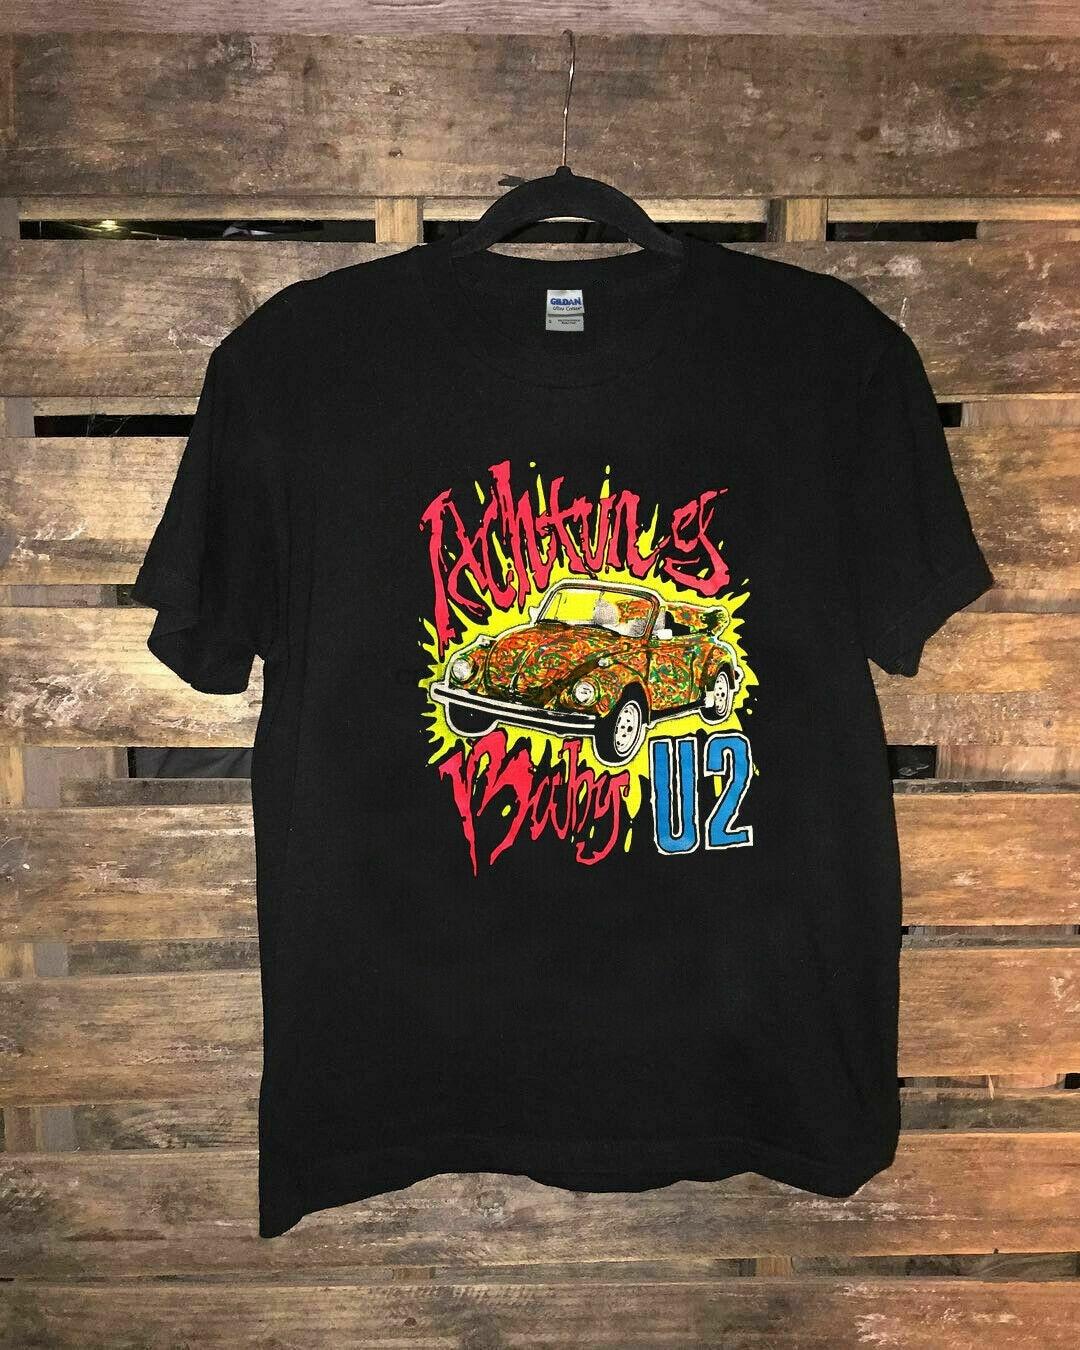 Los huesos equipo sesión Ríndete, Dorothy camiseta oficial BlackHarajuku Hipster camiseta menReprint S-Xxl